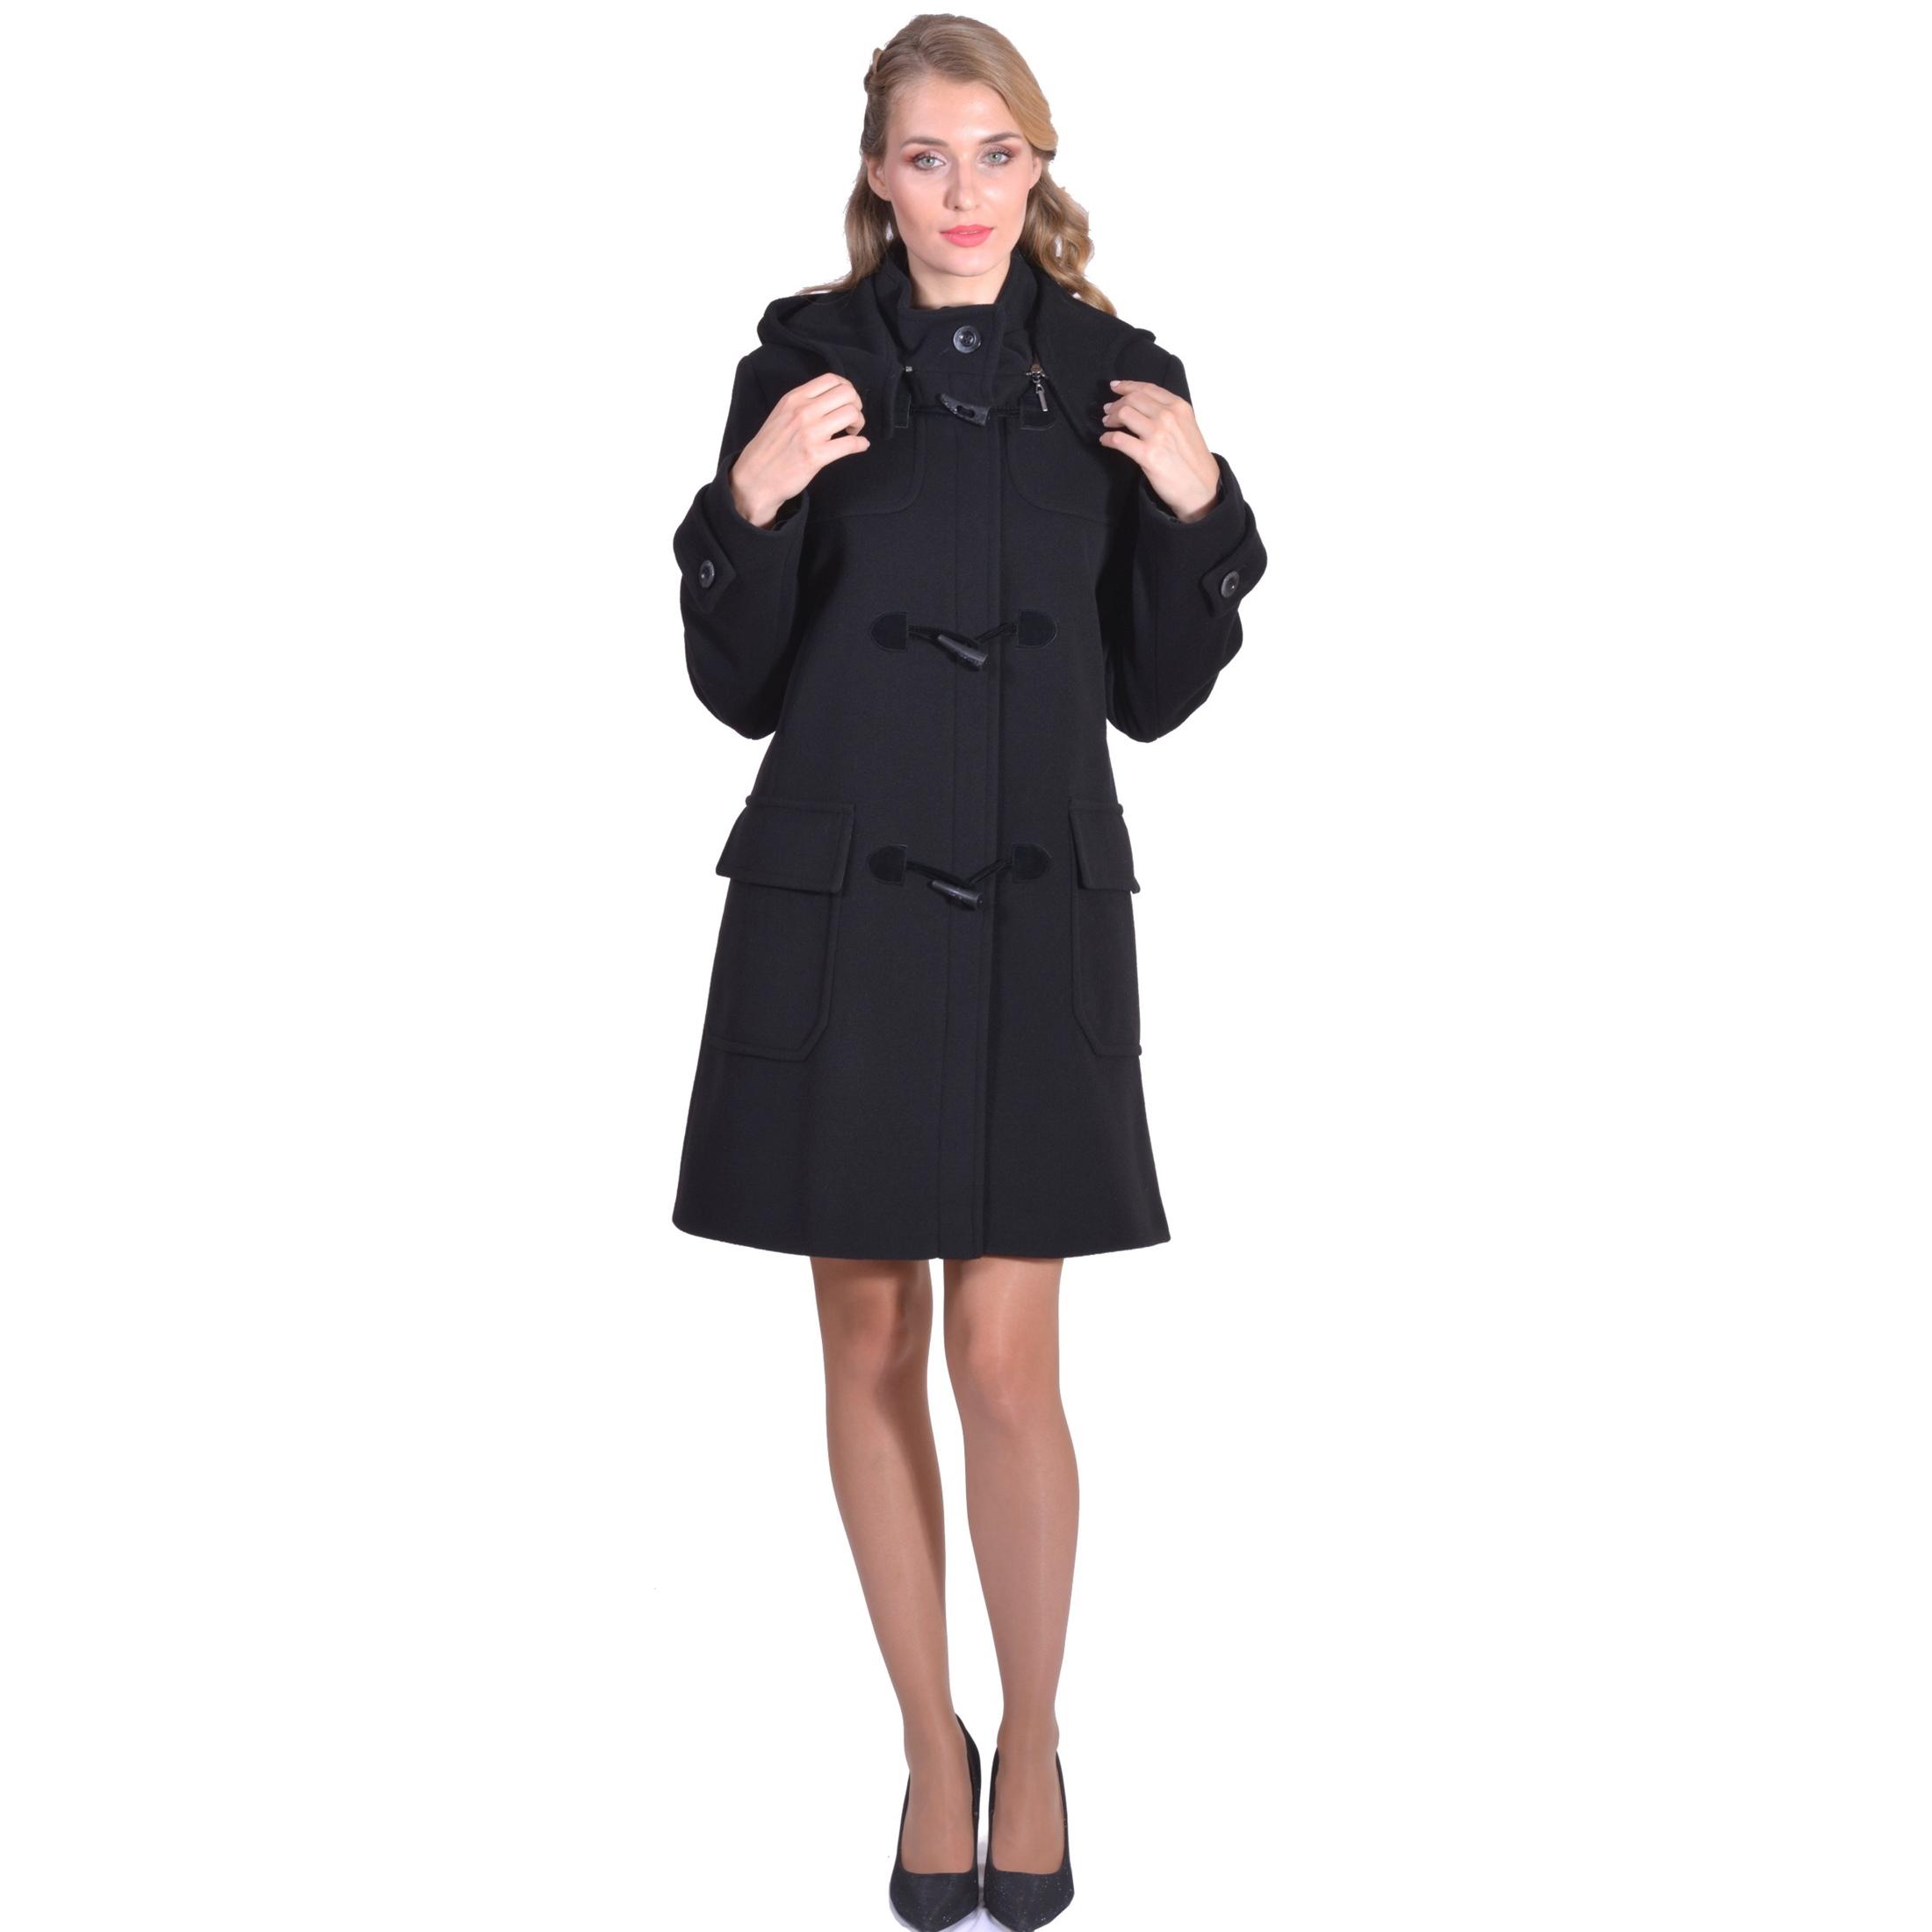 women's montgomery coat,lady m ženski montgomery kaput